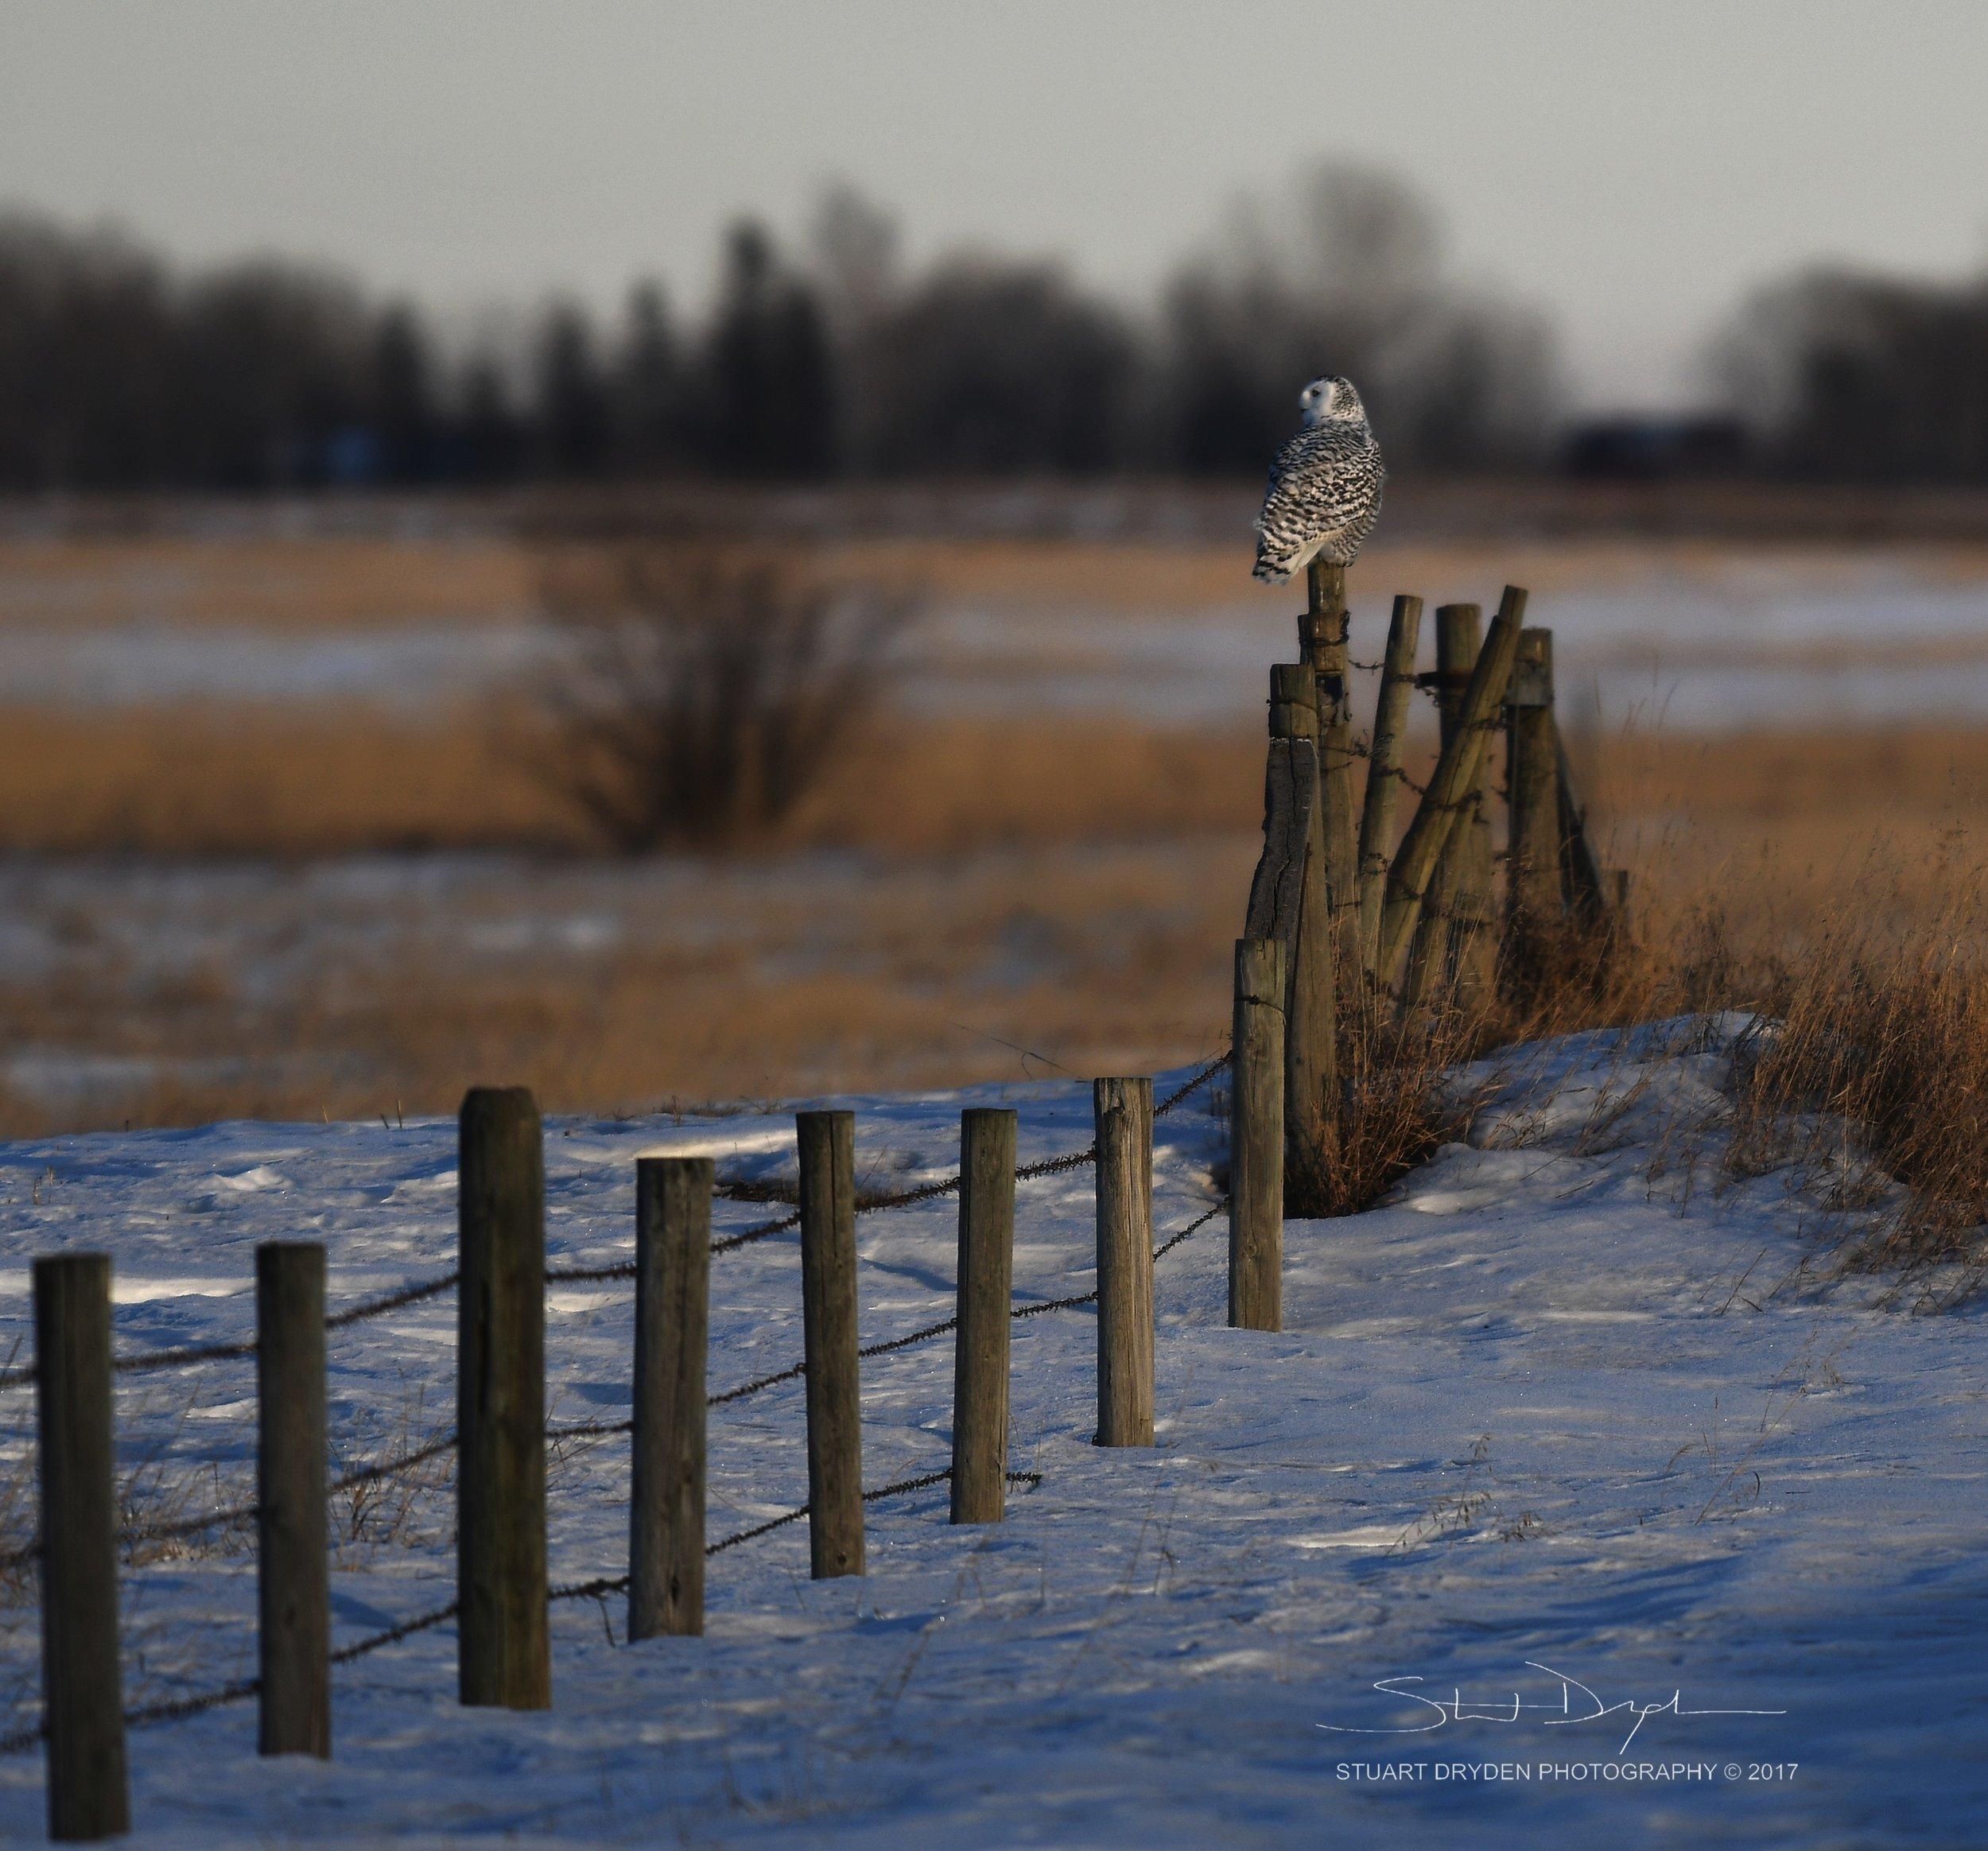 mount-sunset-snowy-owl-jan25-170107.jpg